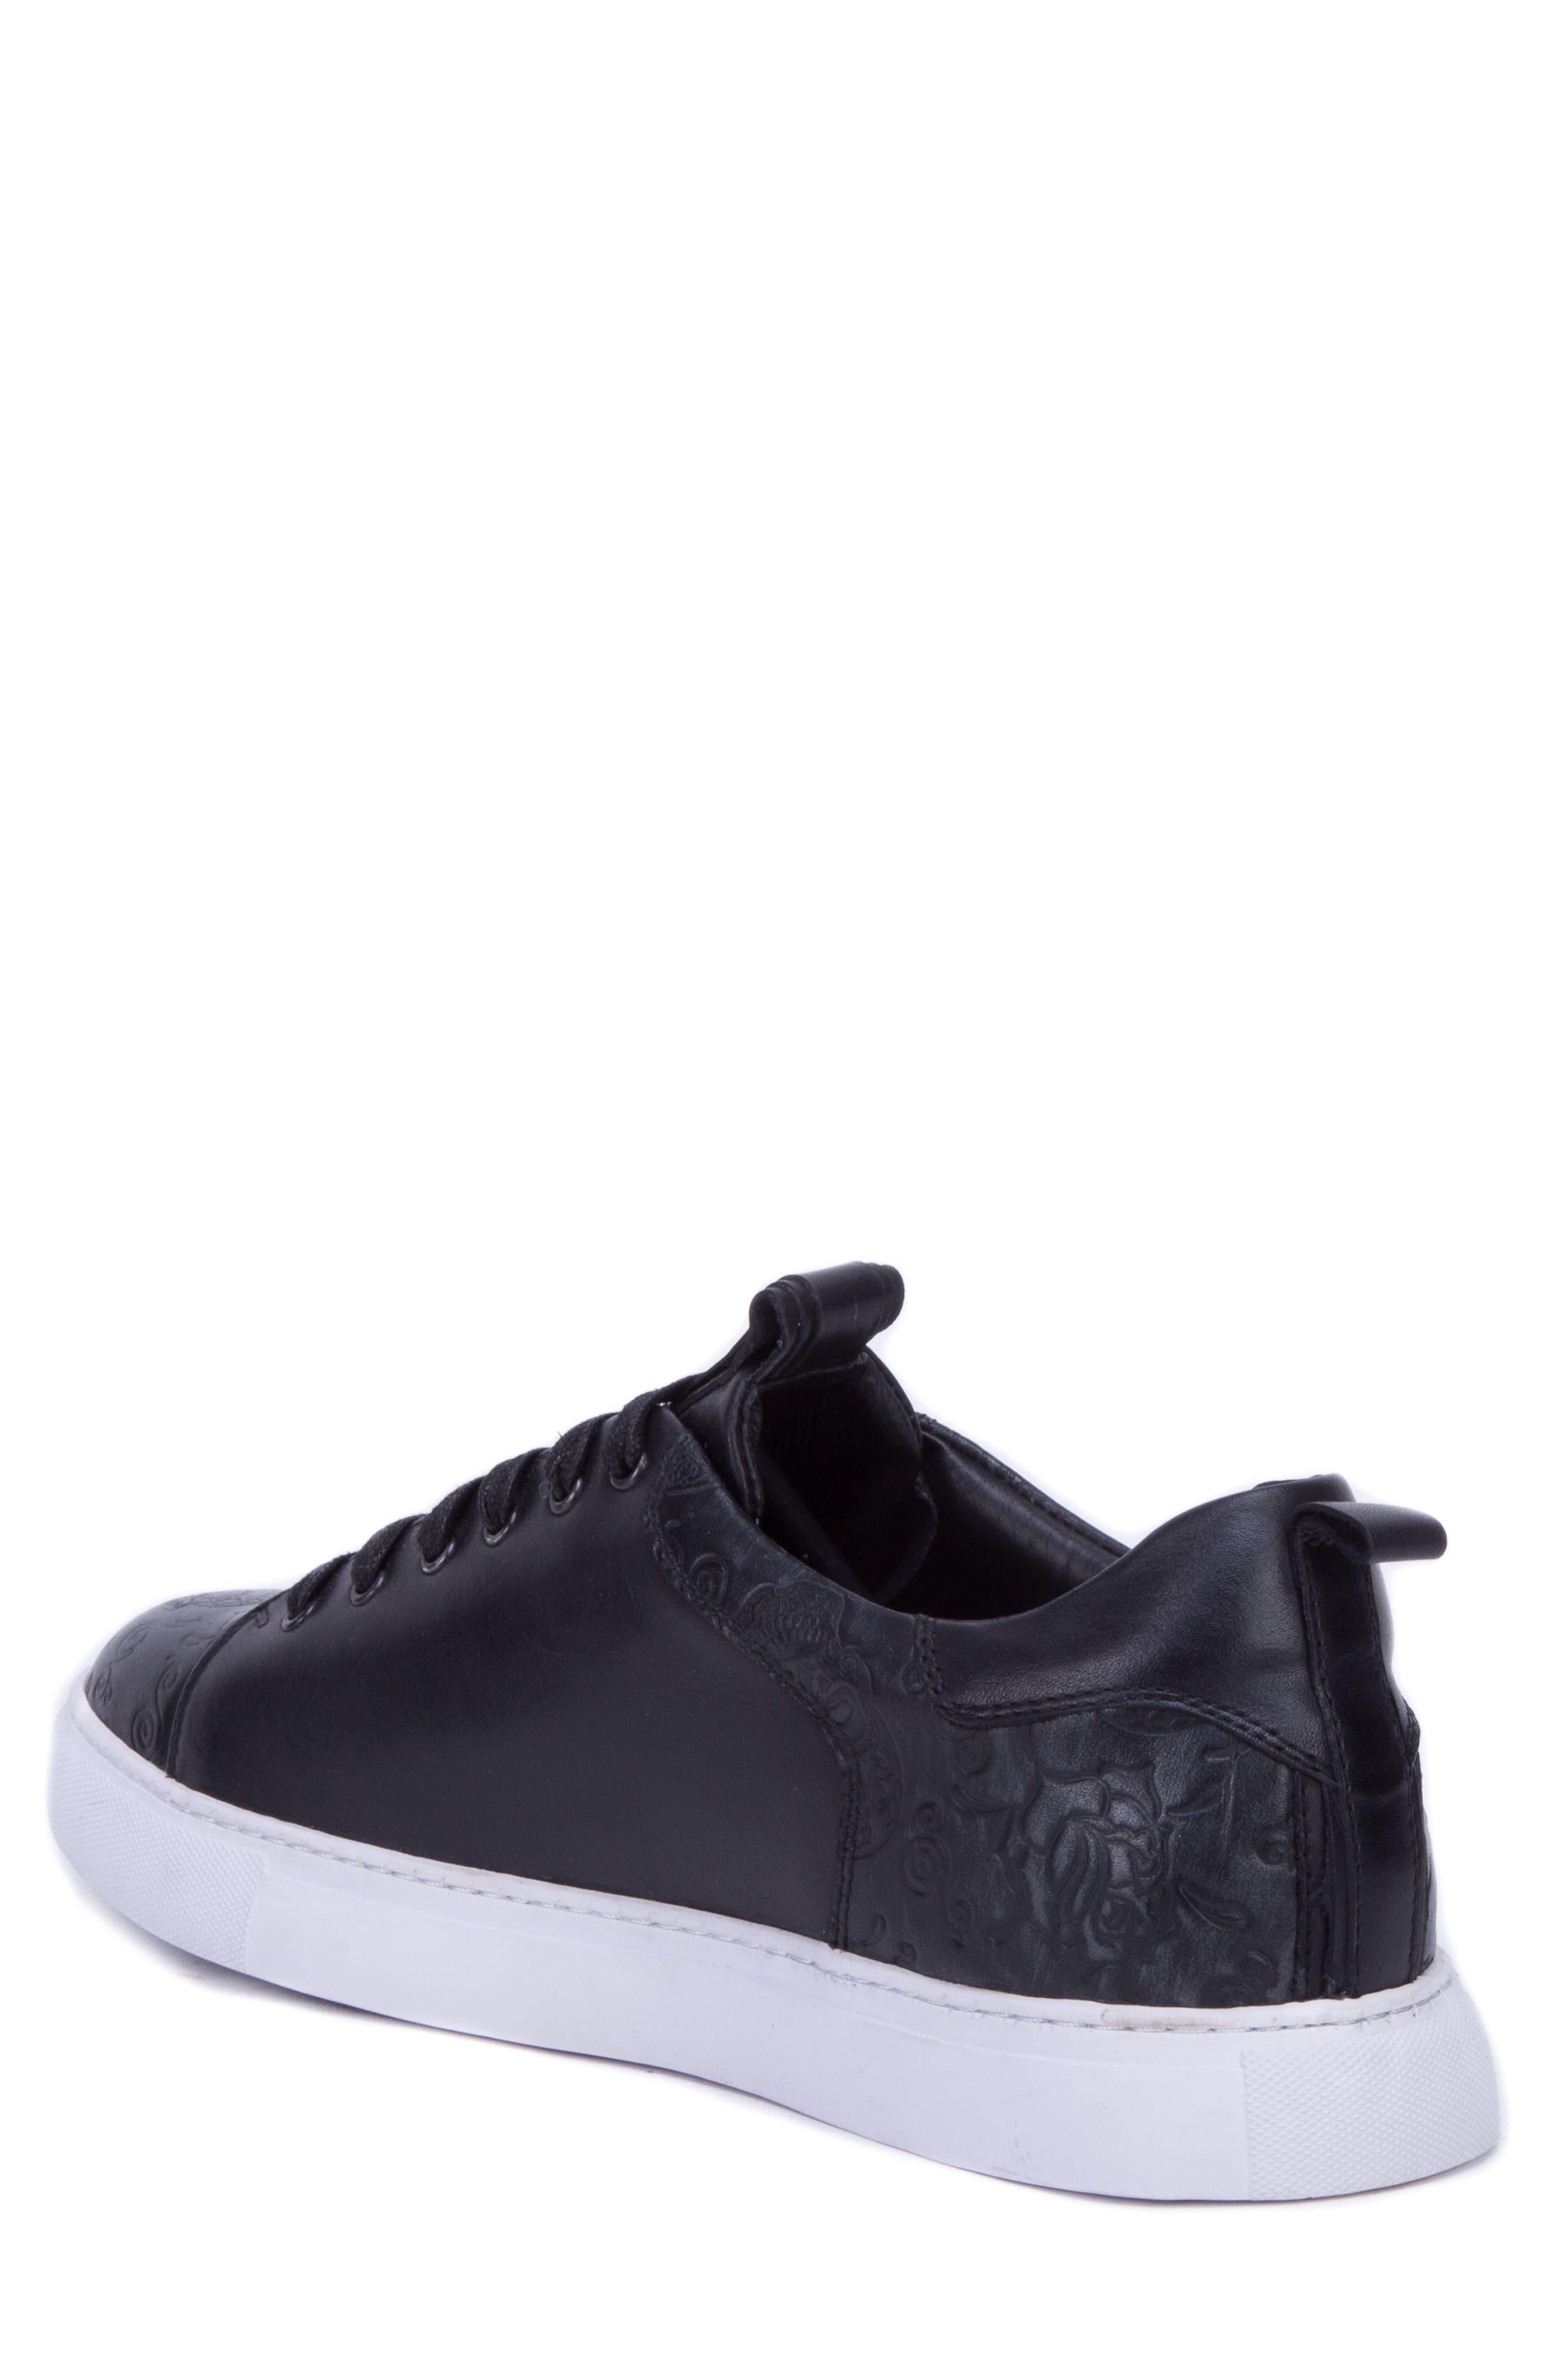 Sanderson Embossed Sneaker,                             Alternate thumbnail 2, color,                             BLACK LEATHER